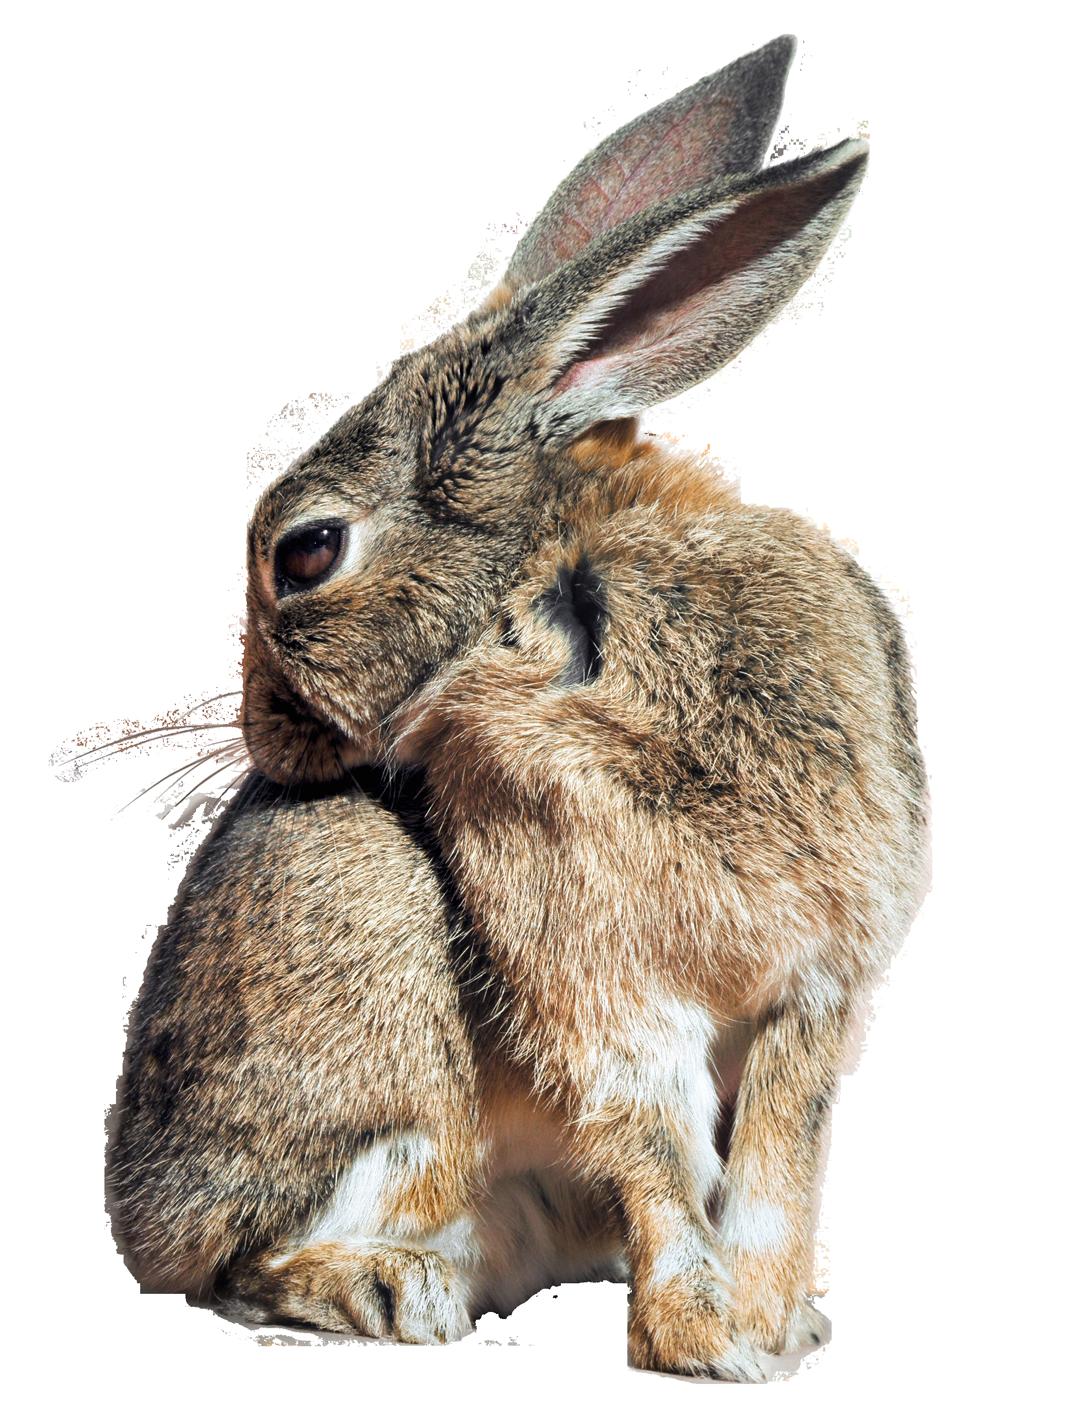 Bunny Rabbit Png Transparent Image - Rabbit, Transparent background PNG HD thumbnail